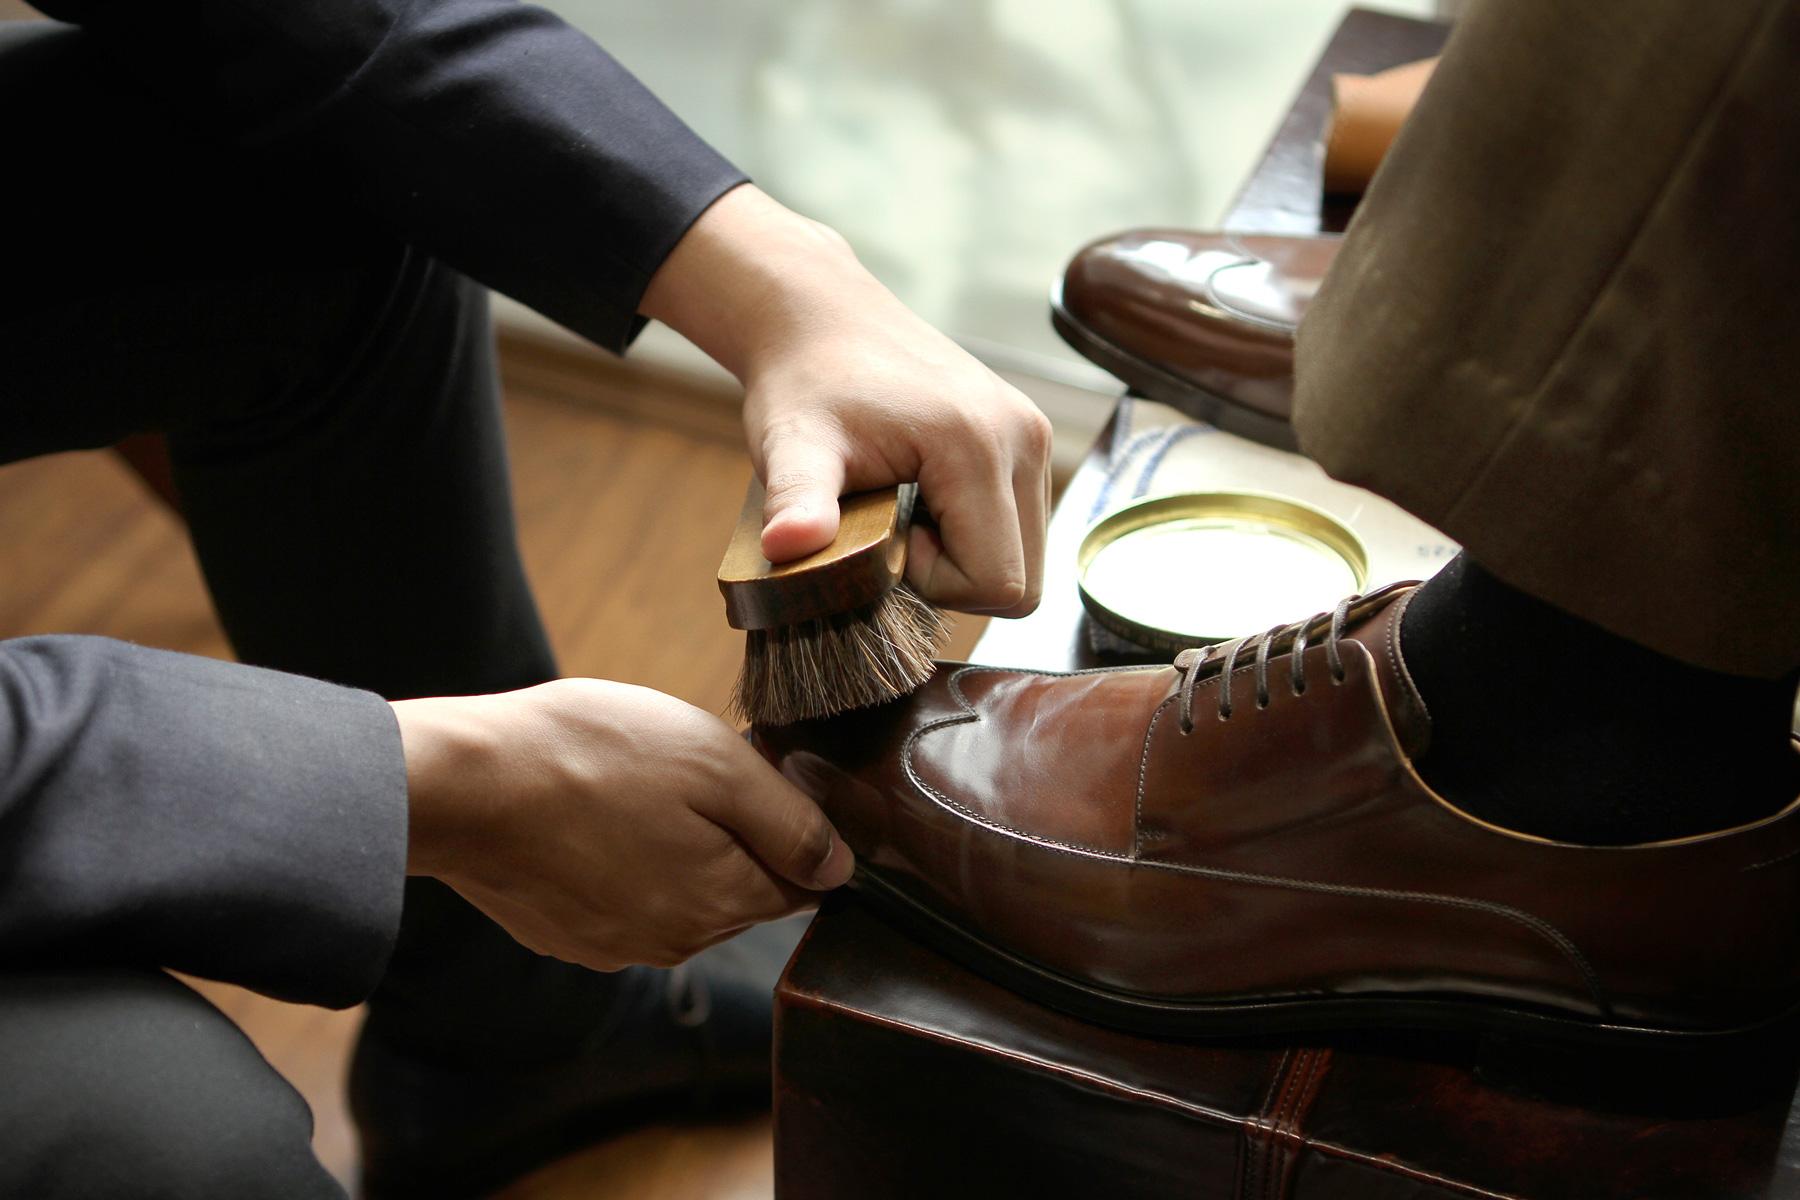 image of man shining shoes